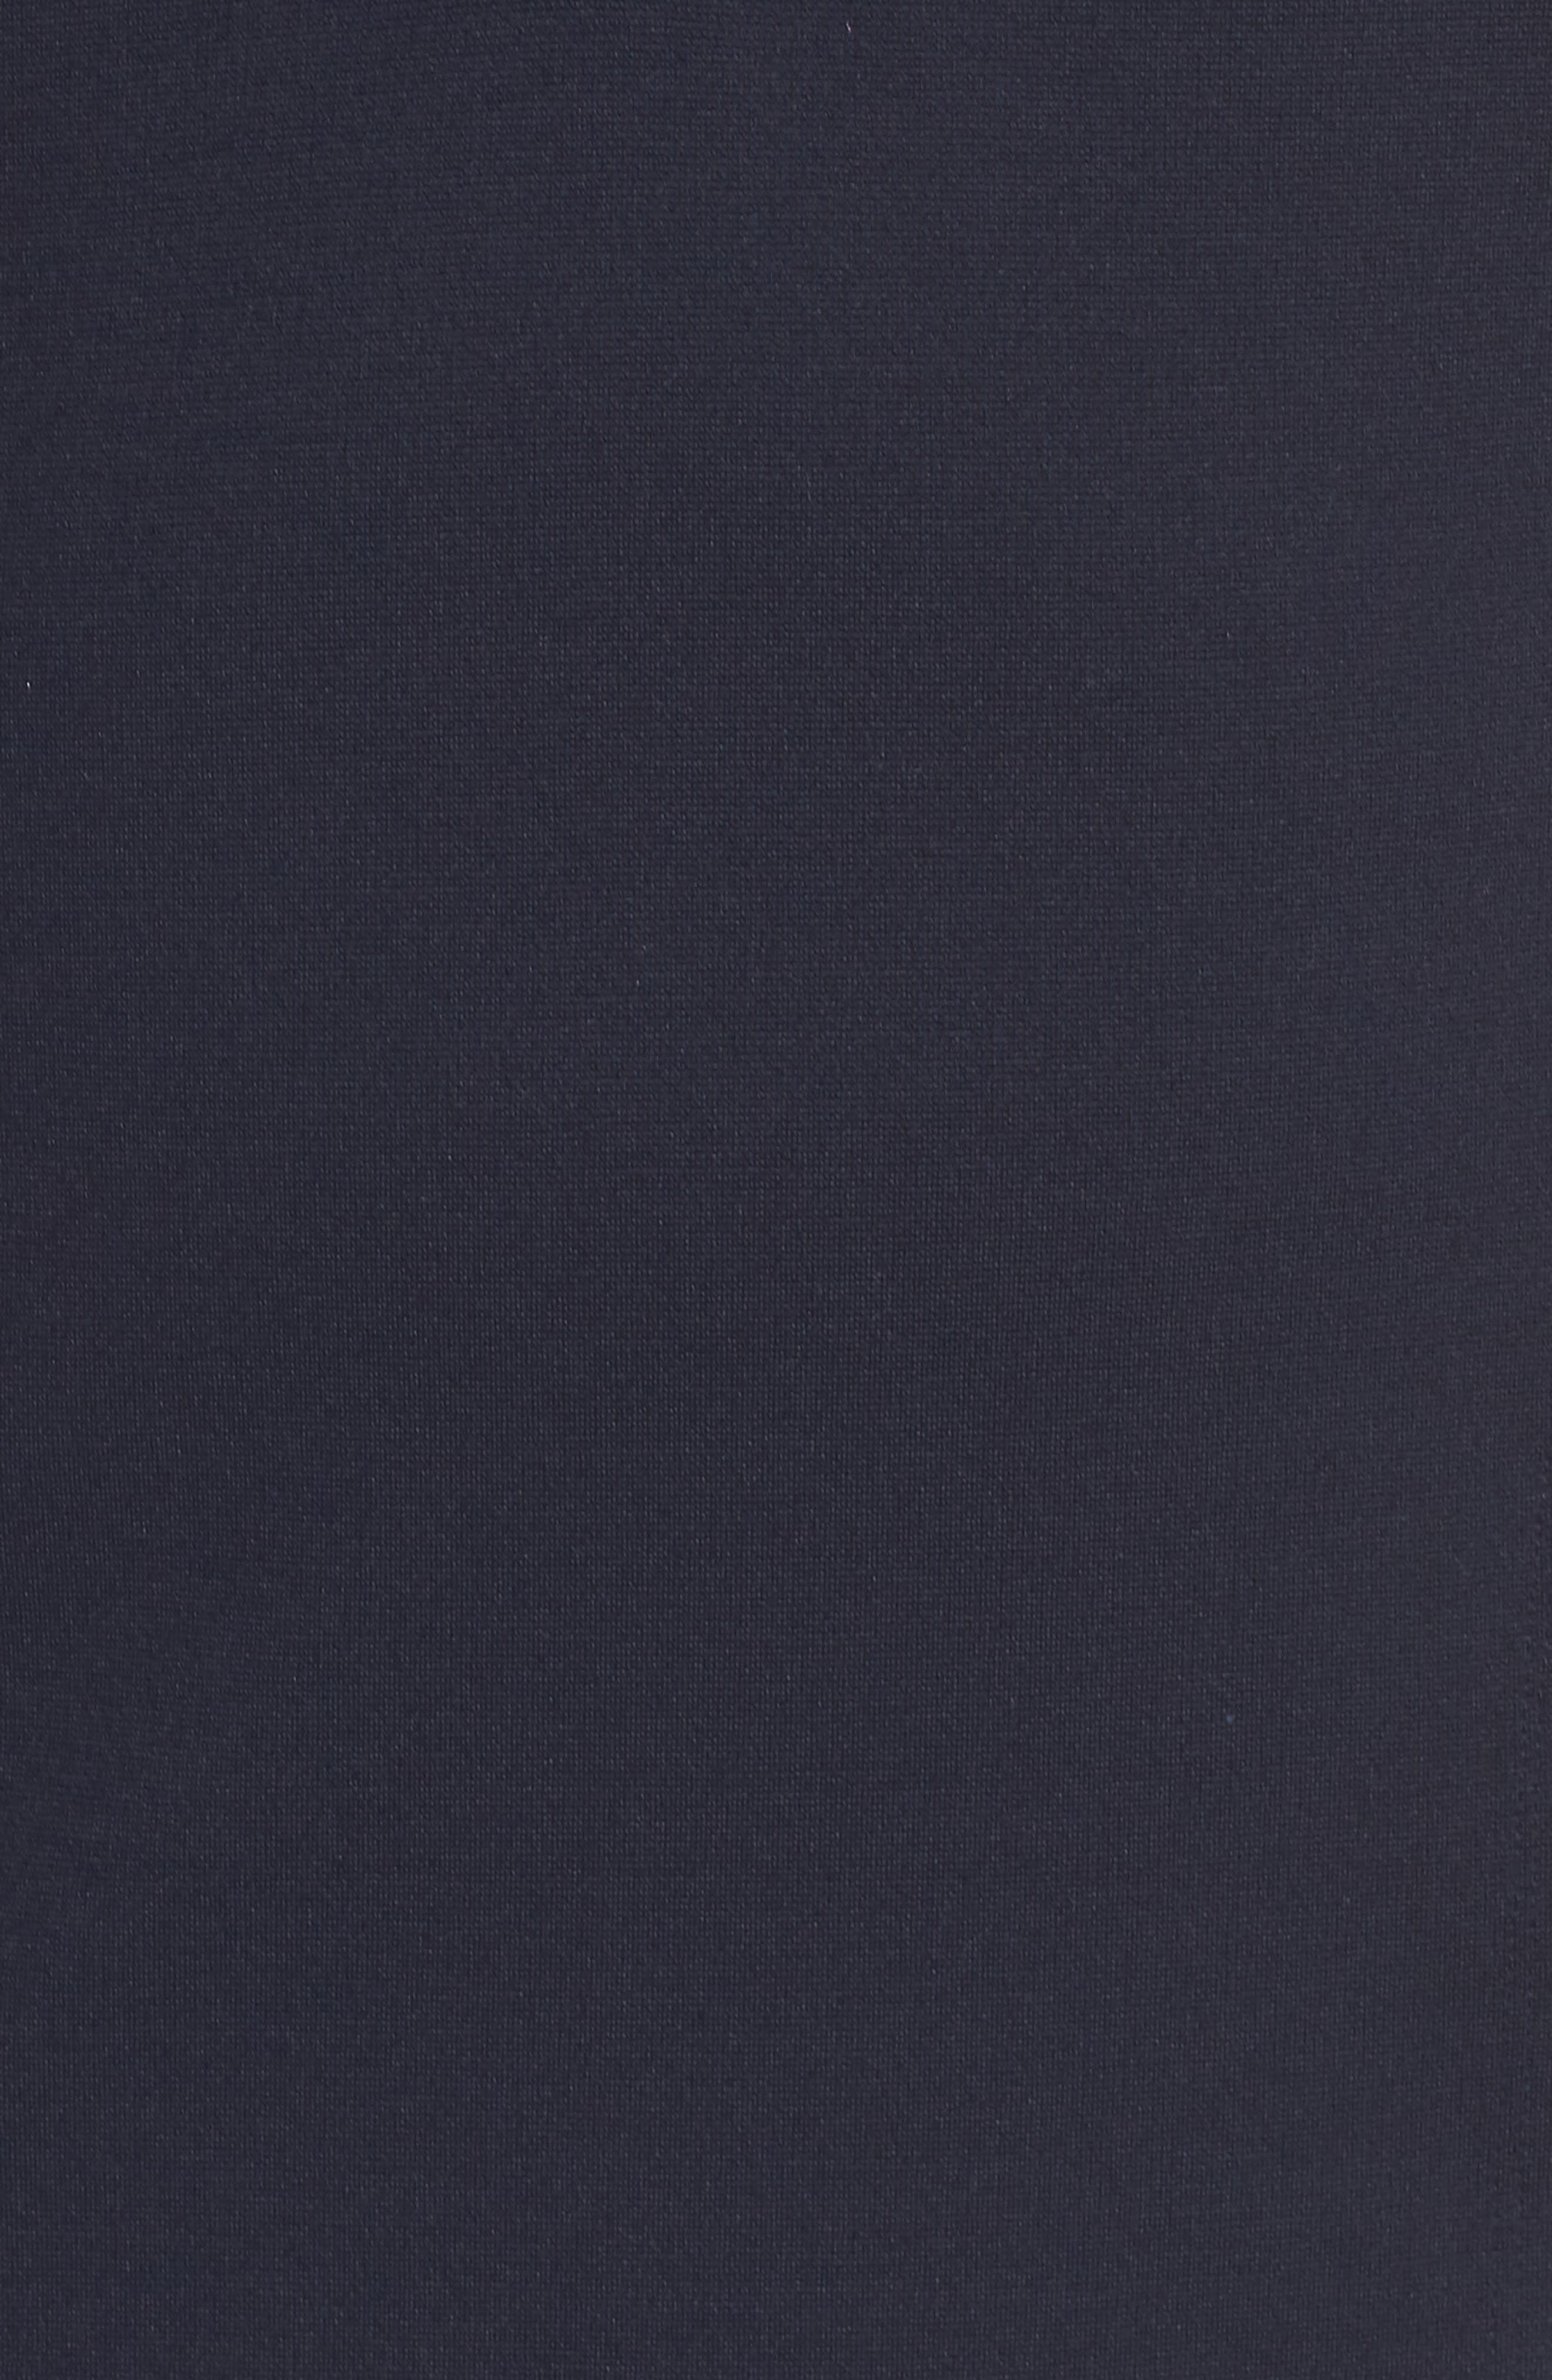 Poplin Collar Knit Dress,                             Alternate thumbnail 5, color,                             410